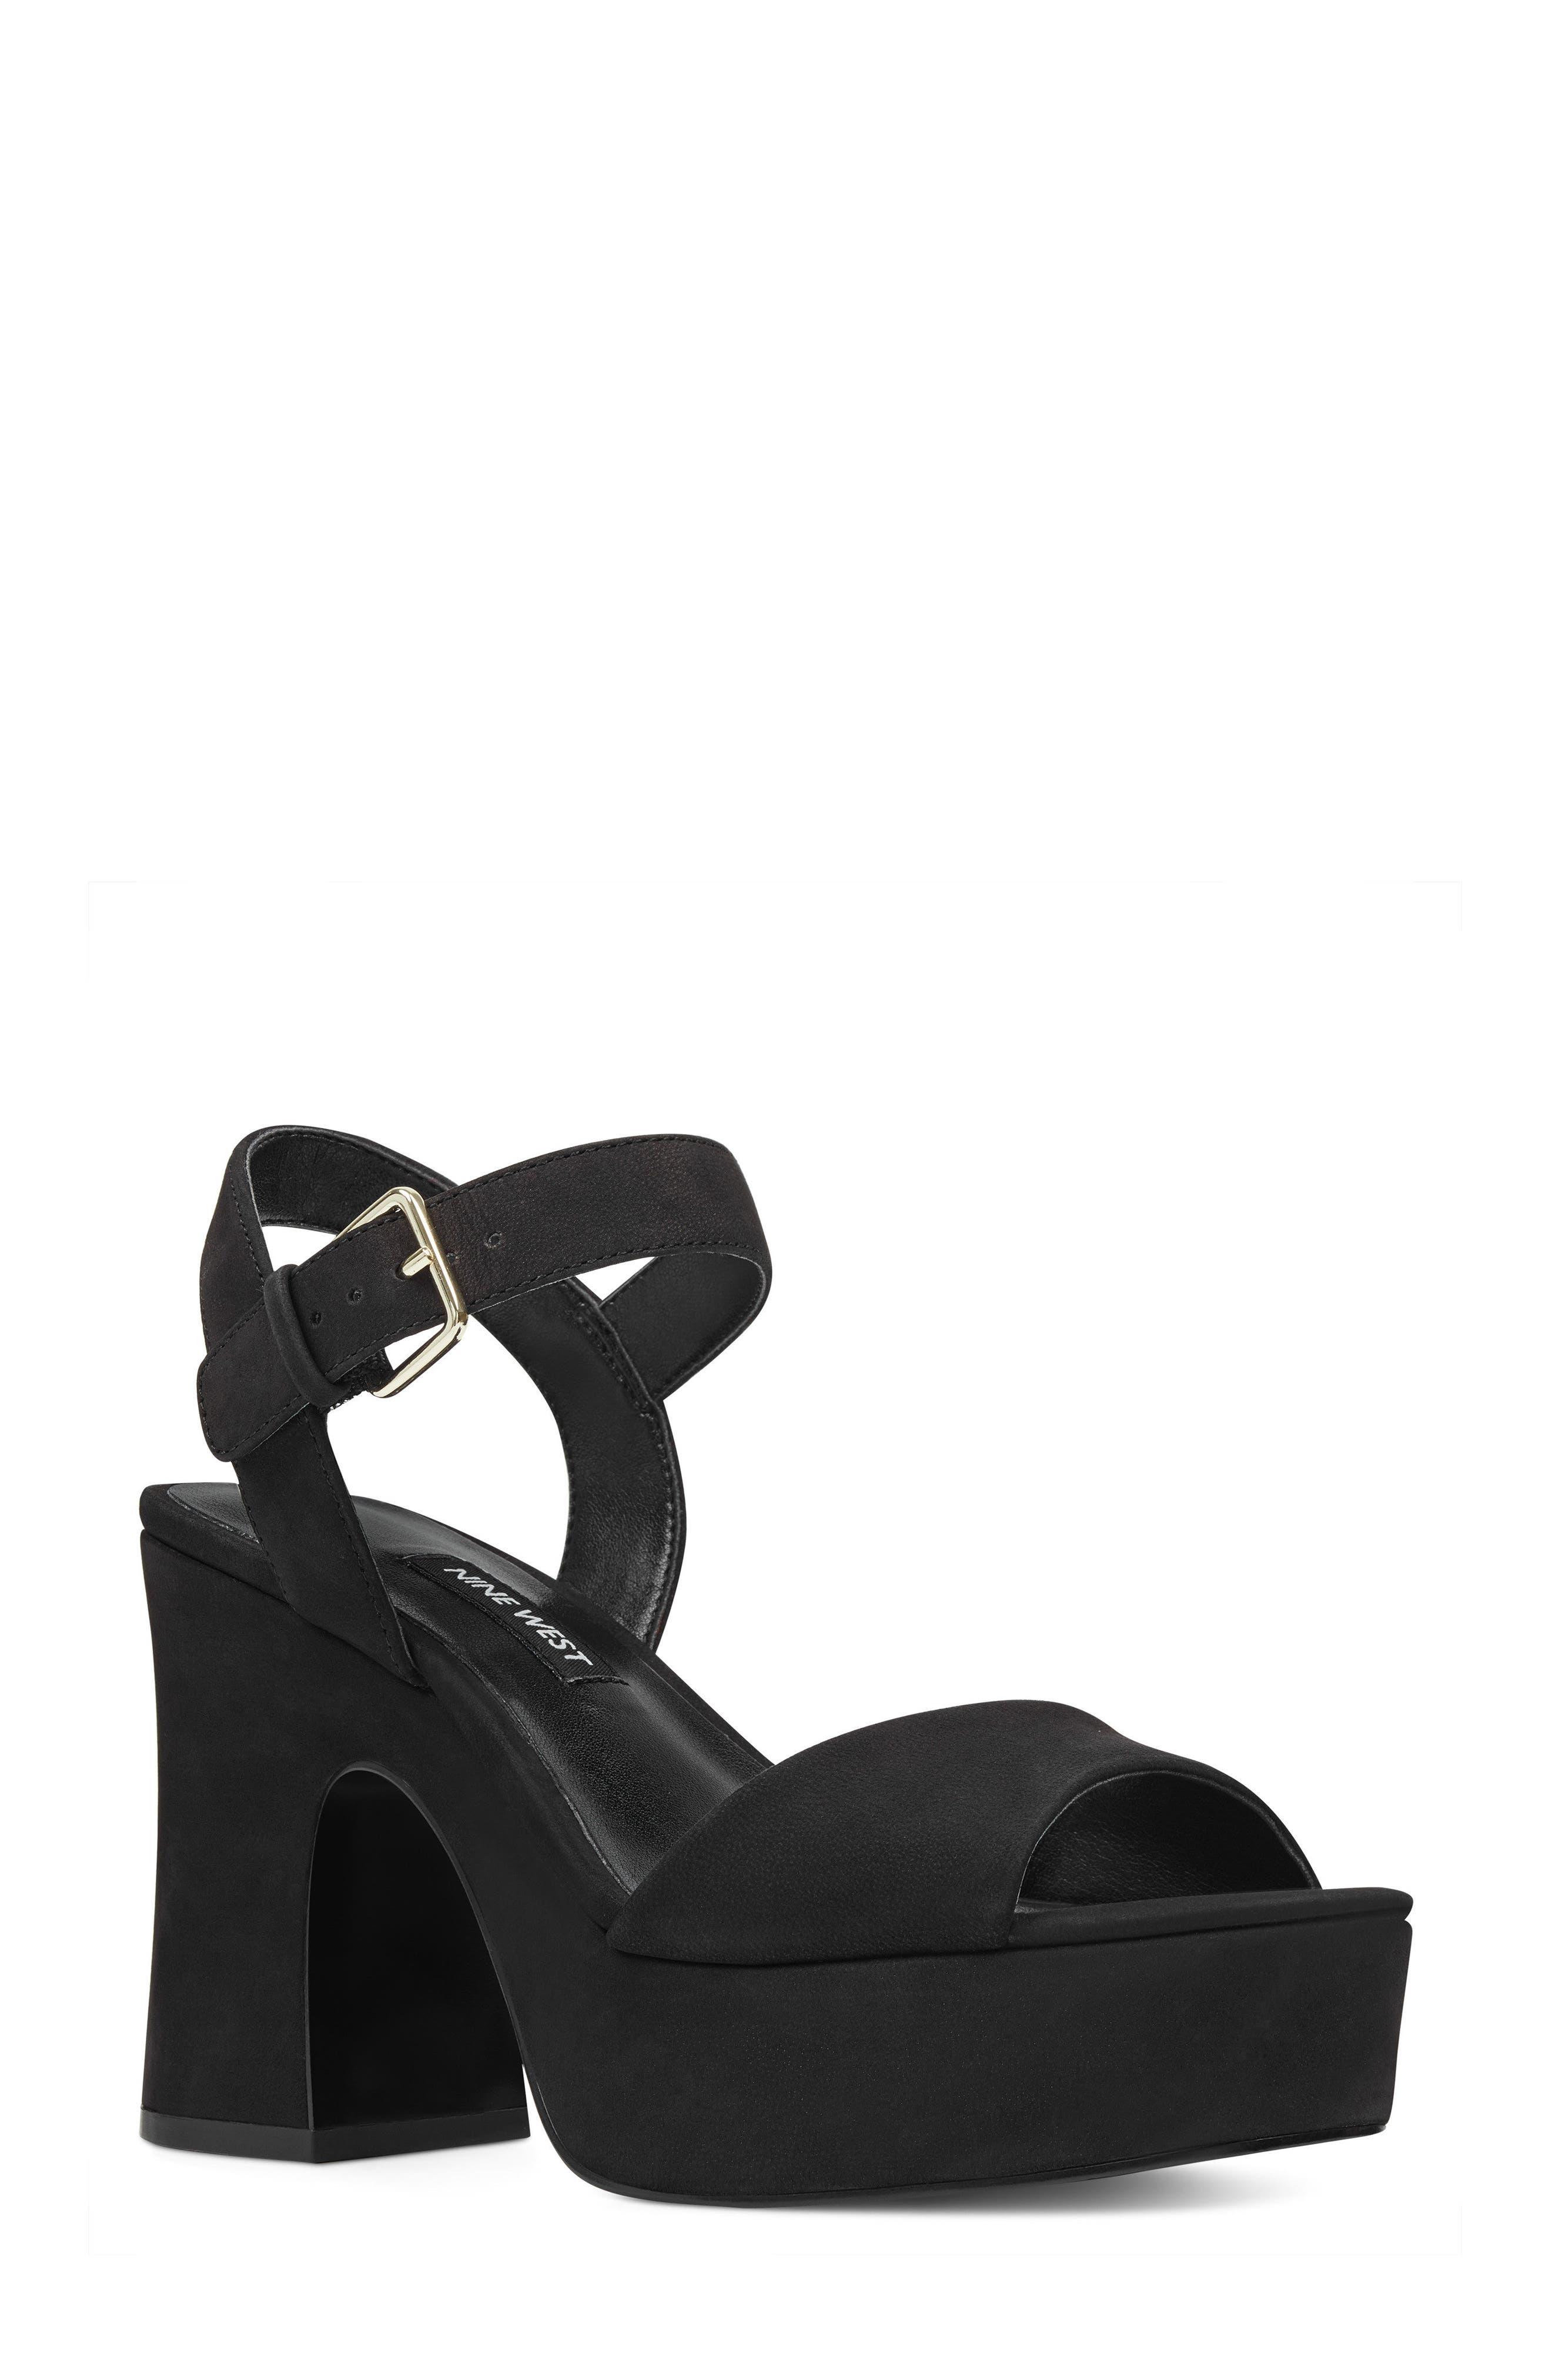 FallForU Platform Sandal,                         Main,                         color, Black Leather